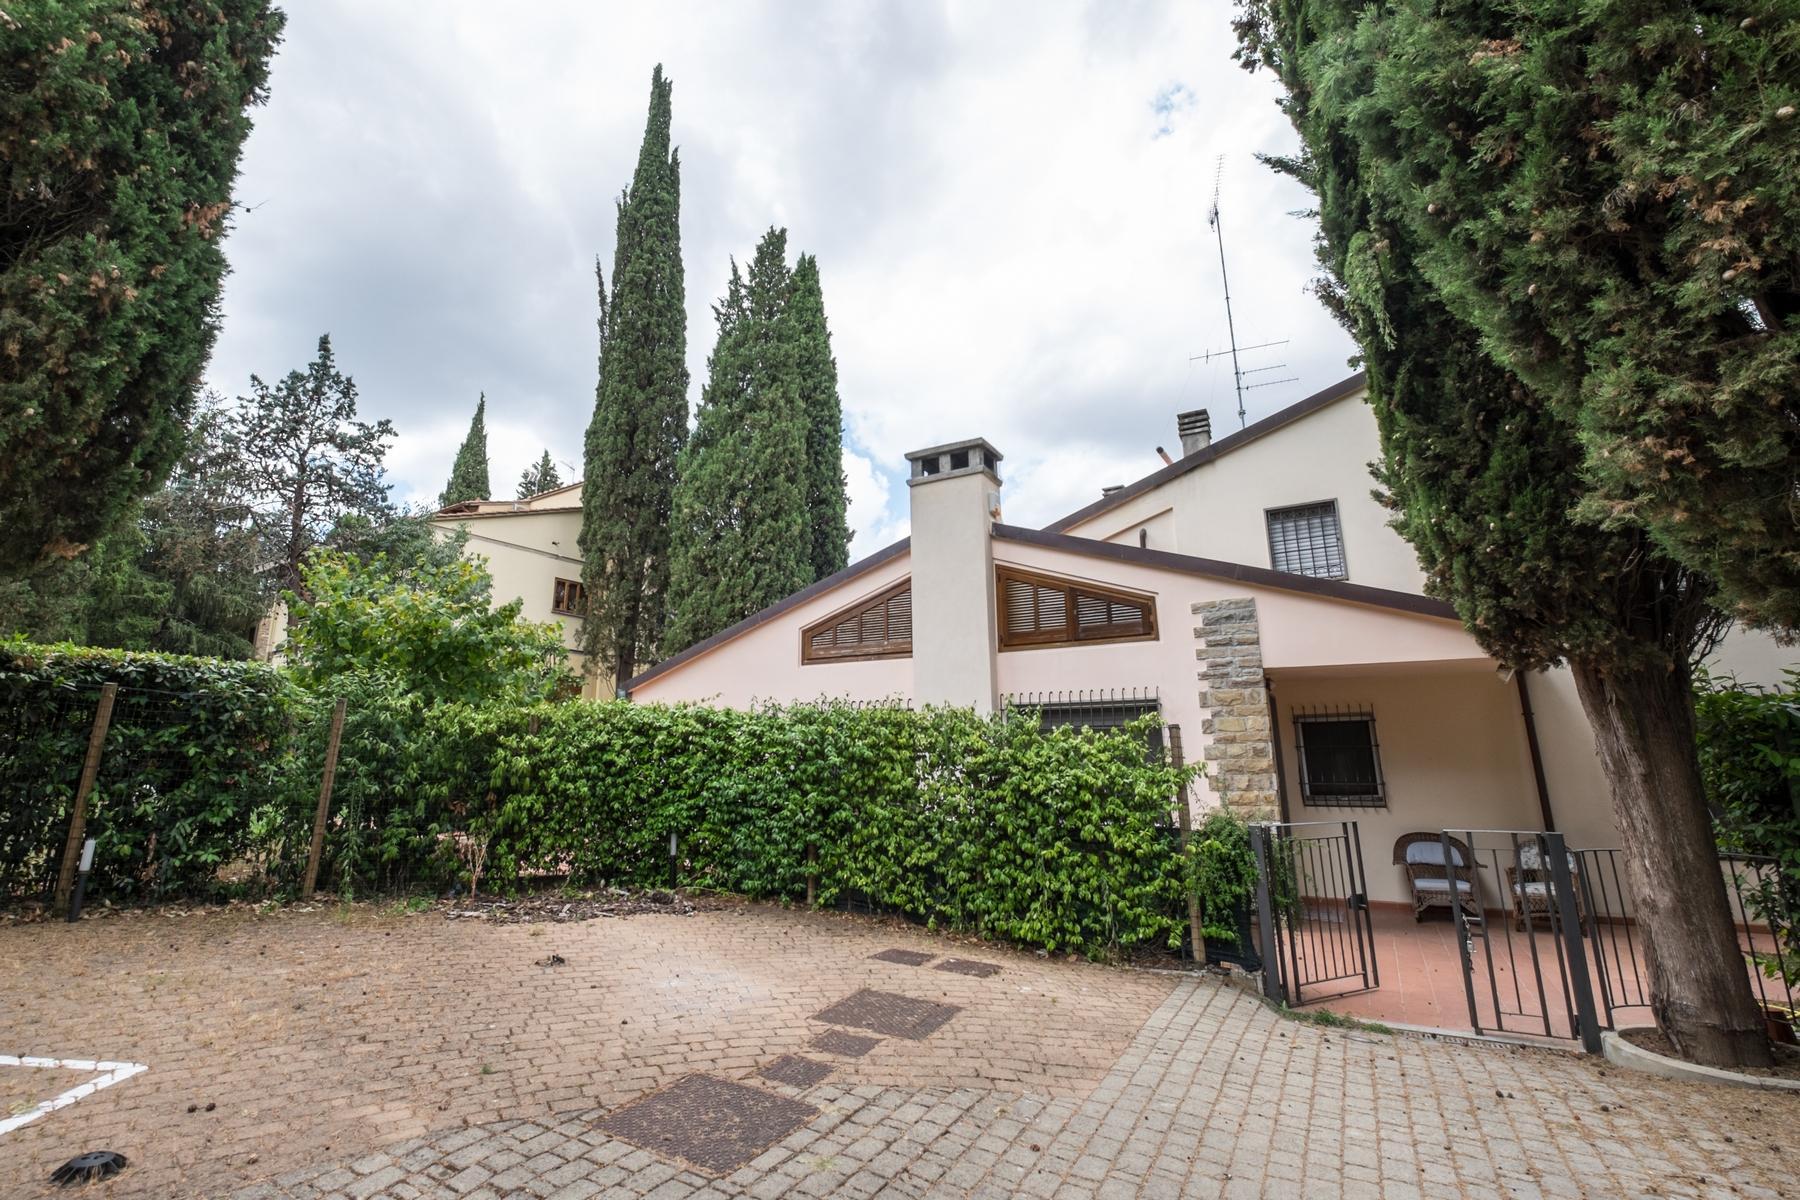 Lovely apartment in exclusive Poggio Imperiale area - 10